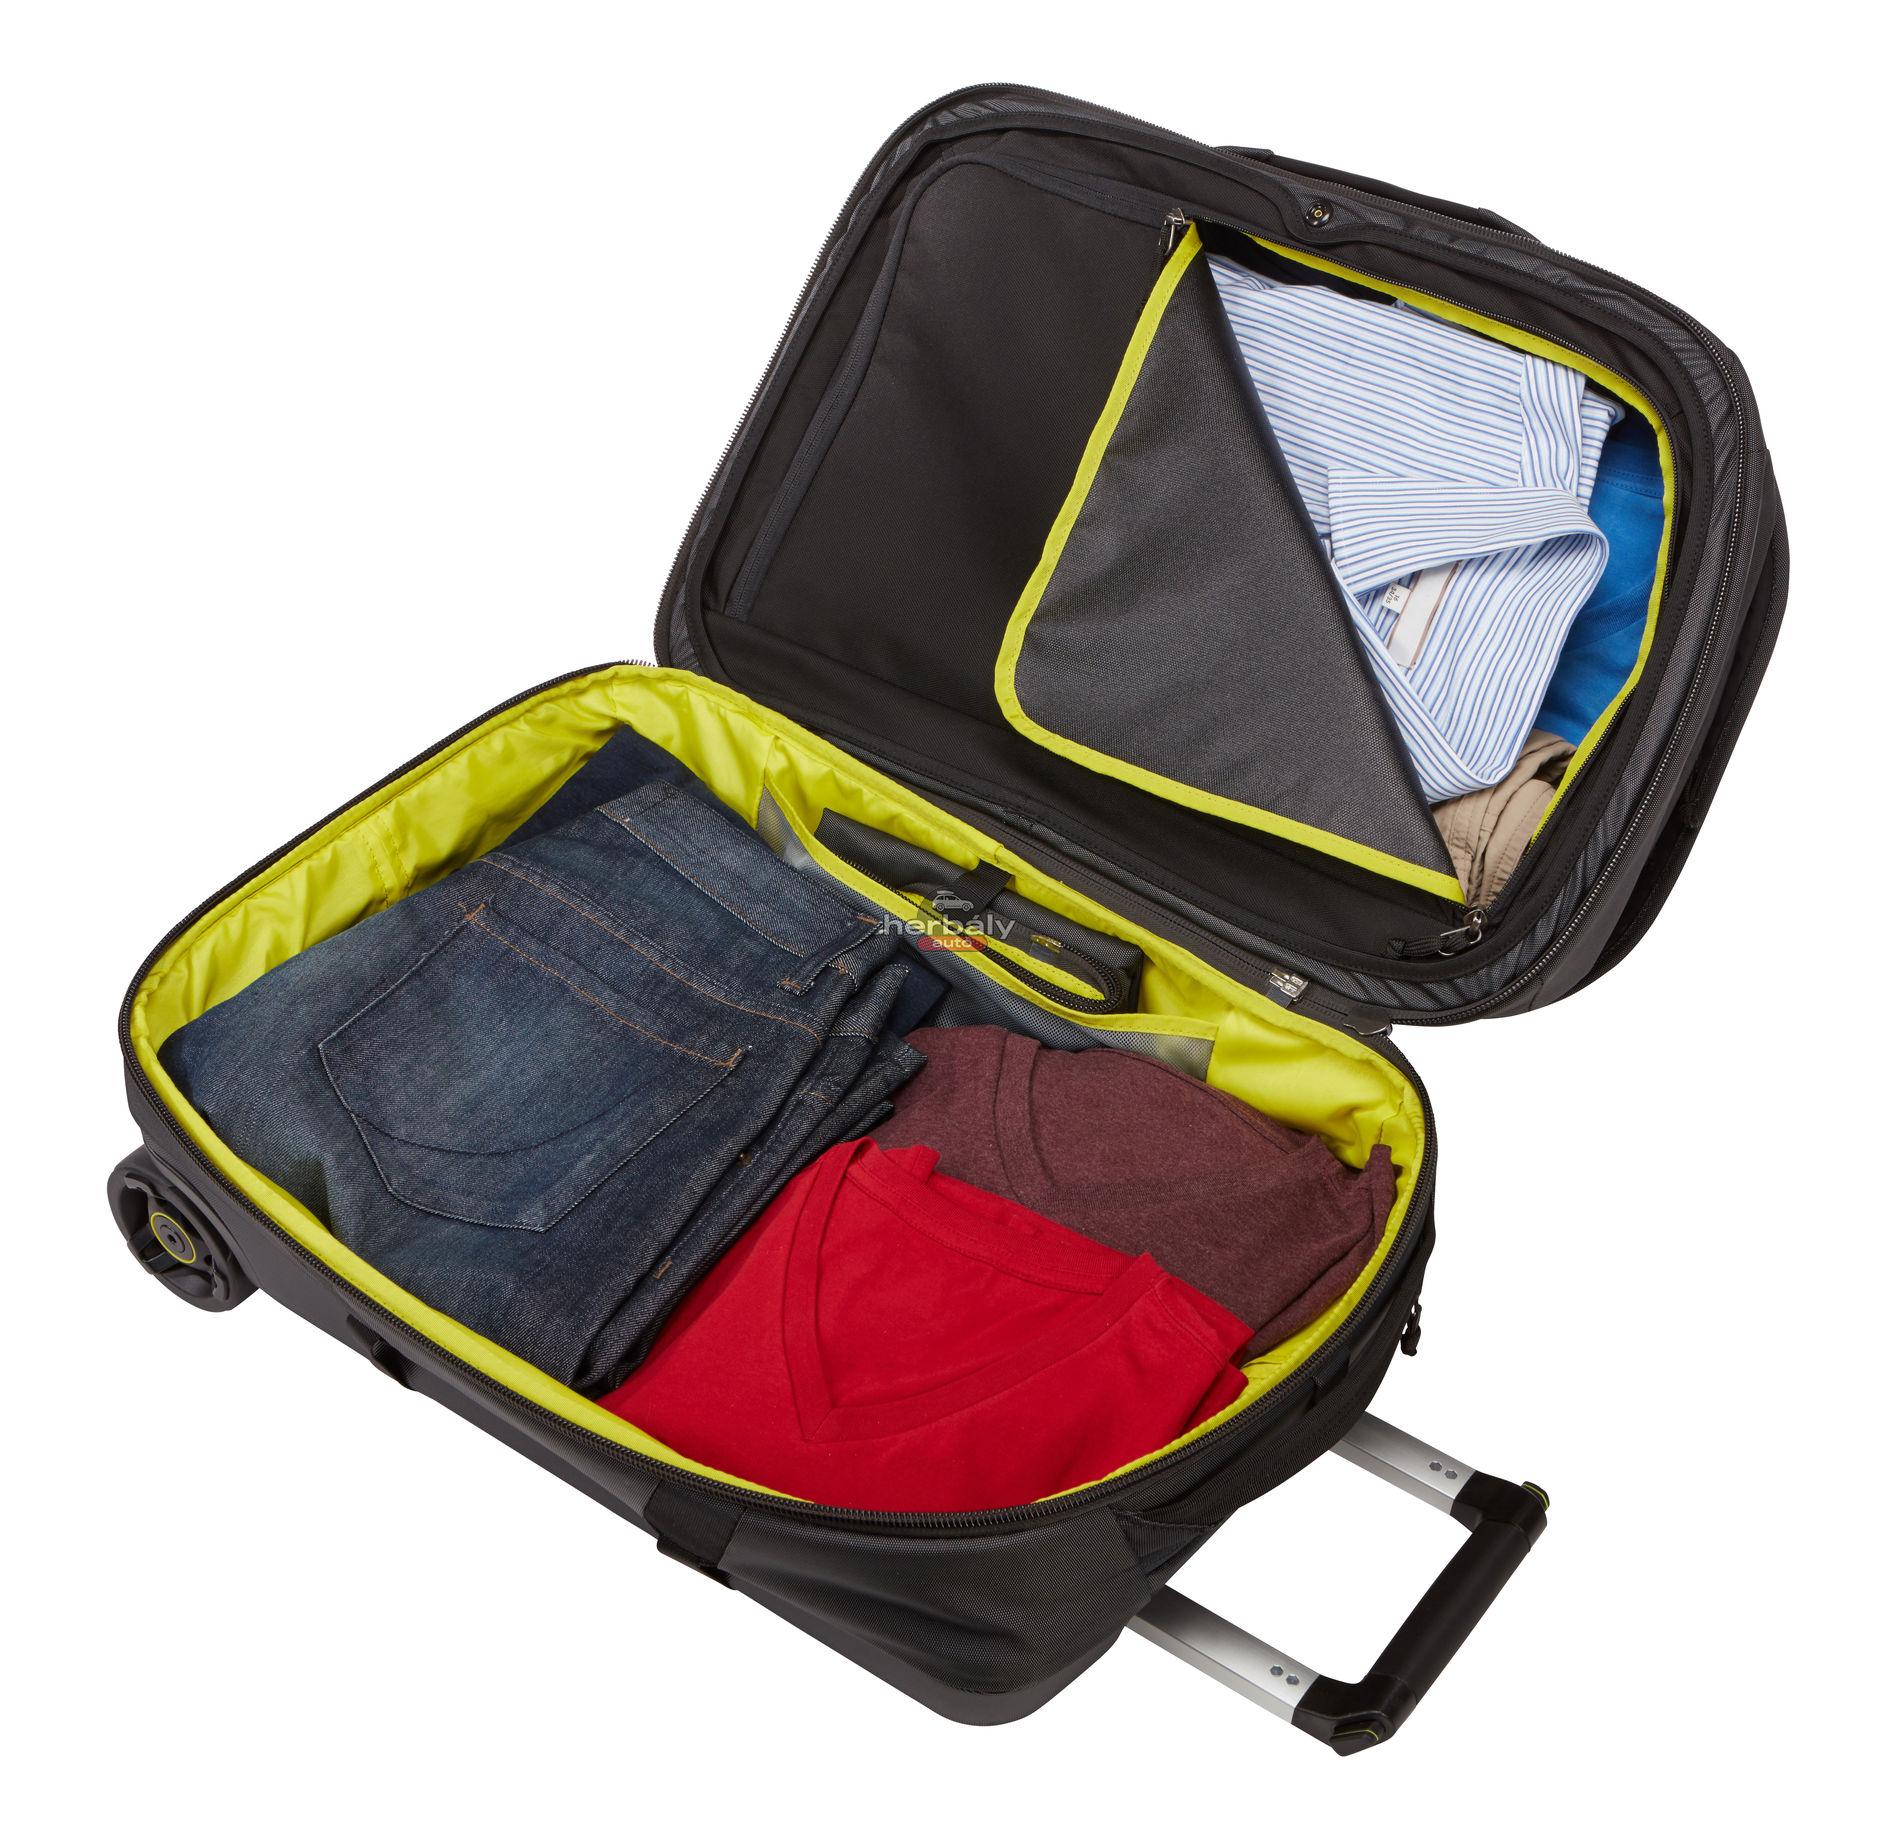 Thule Subterra TSR-356DSH 56L gurulós bőrönd, fekete